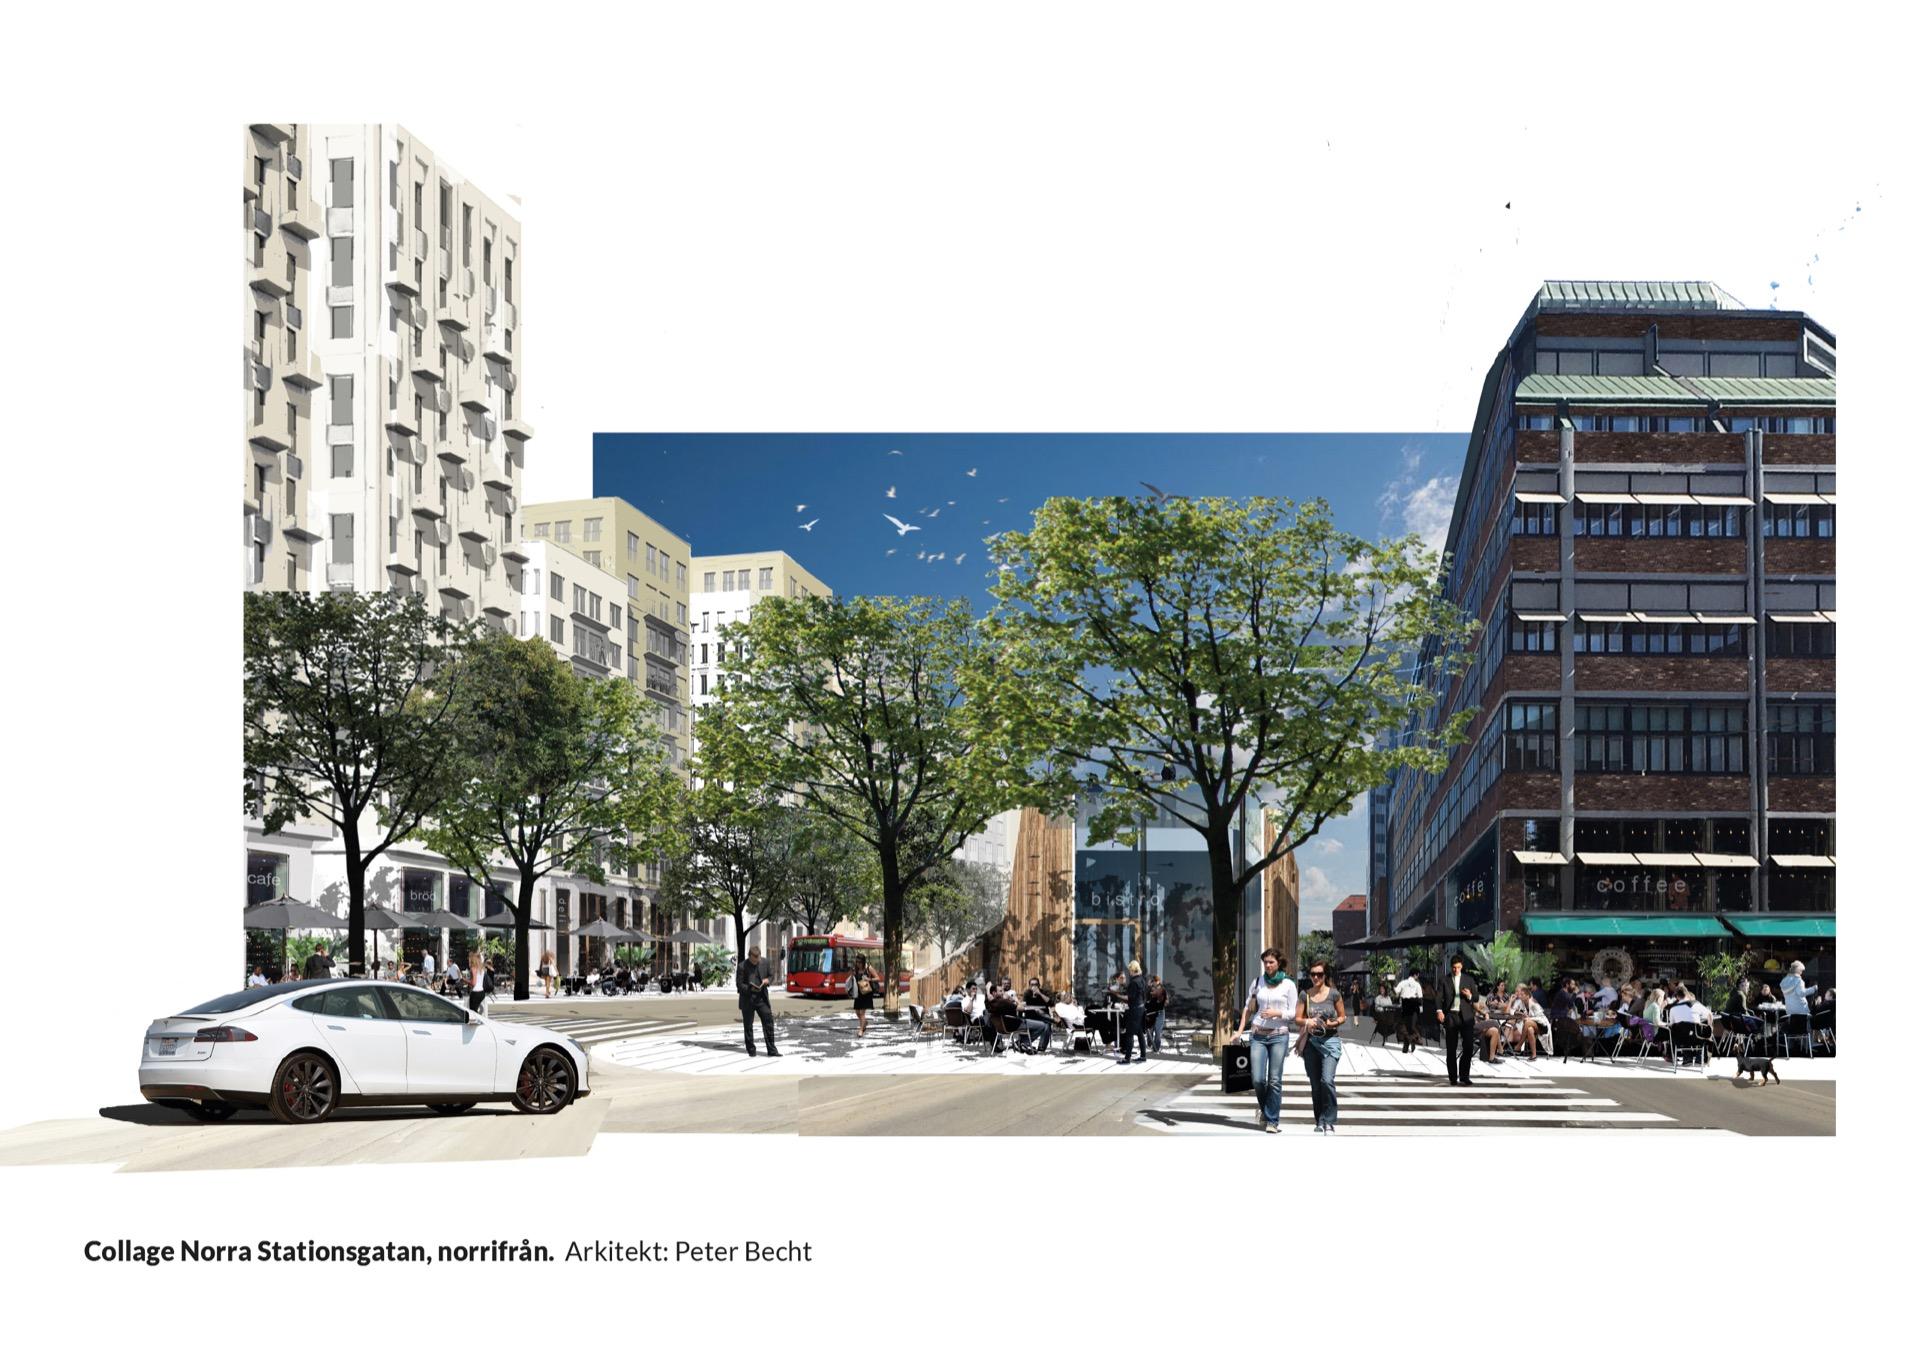 Collage Norra Stationsgatan, norrifrån. Arkitekt: Peter Becht